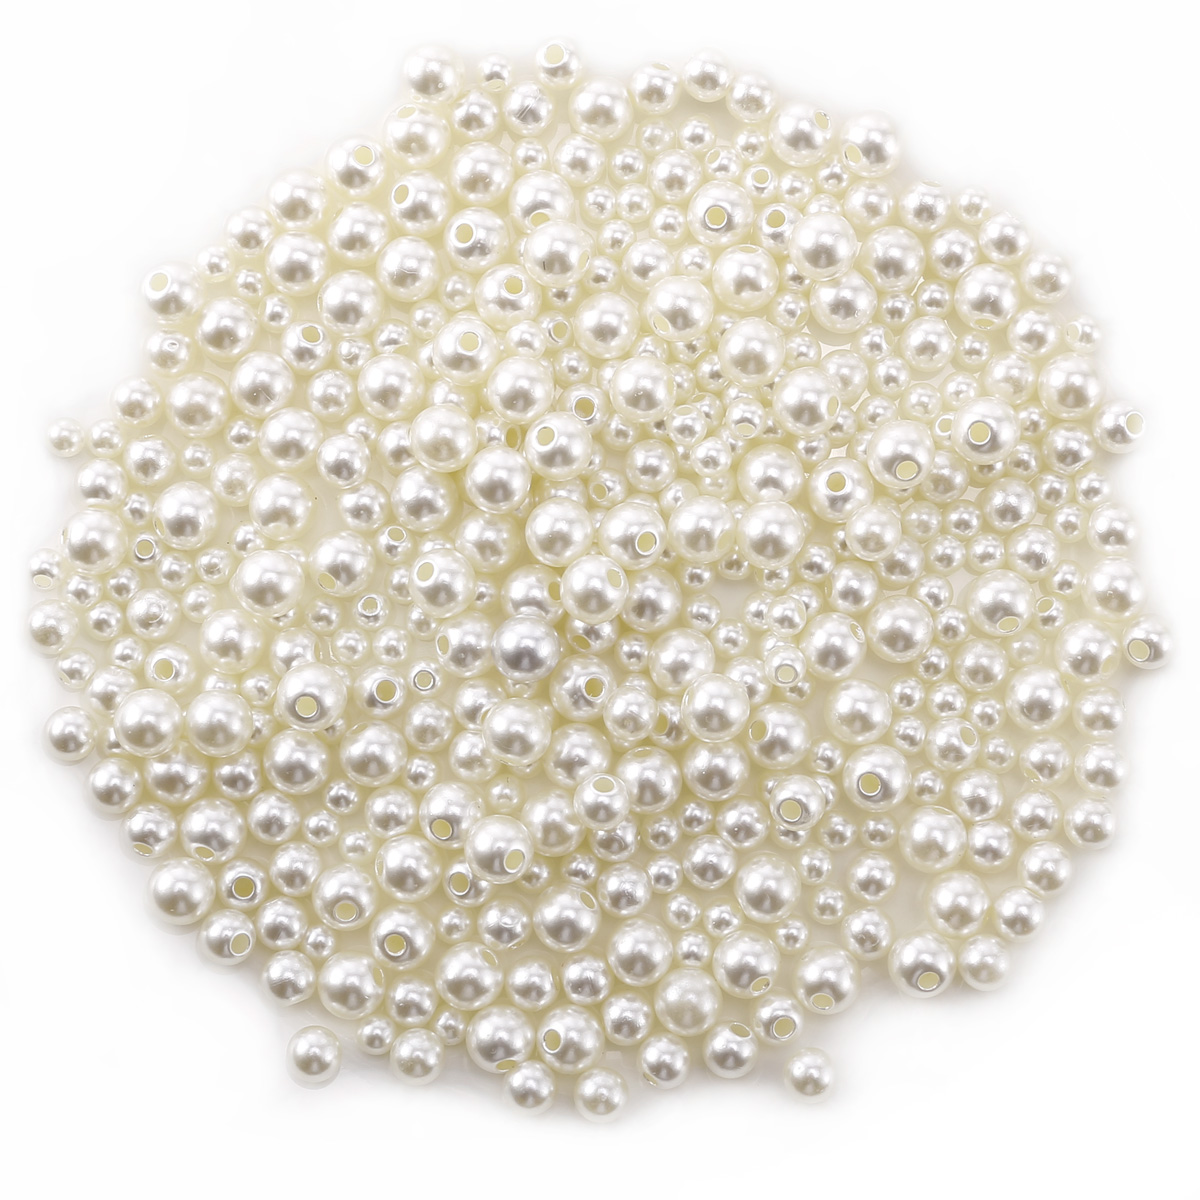 400pcs Remaches Perlas para Decorar Vestido Novia Velo Bolso Zapatilla 6//8//10mm